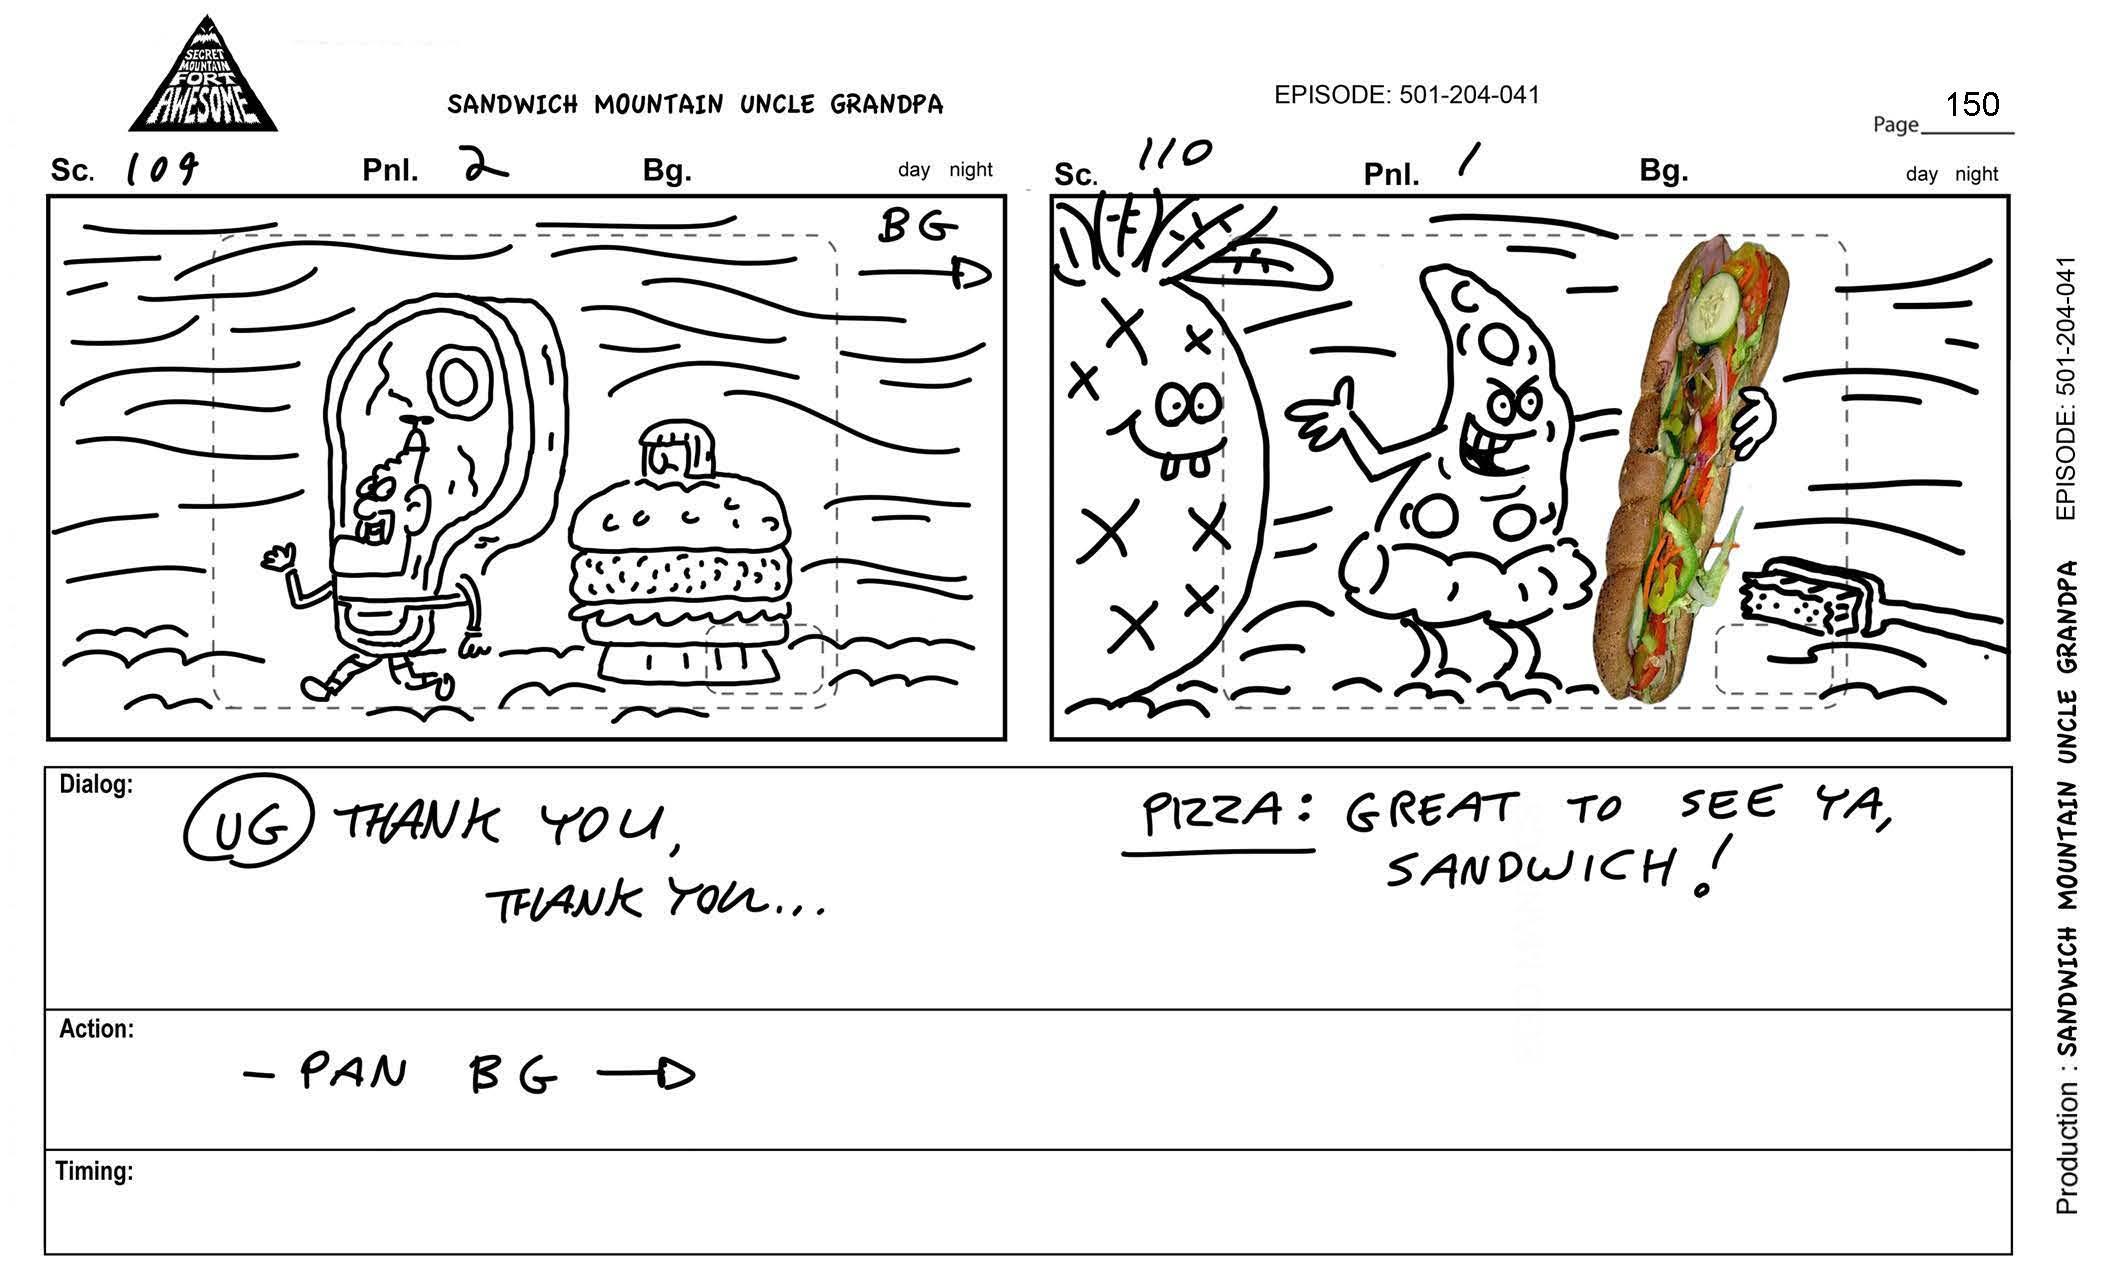 SMFA_SandwichMountainUncleGrandpa_Page_150.jpg